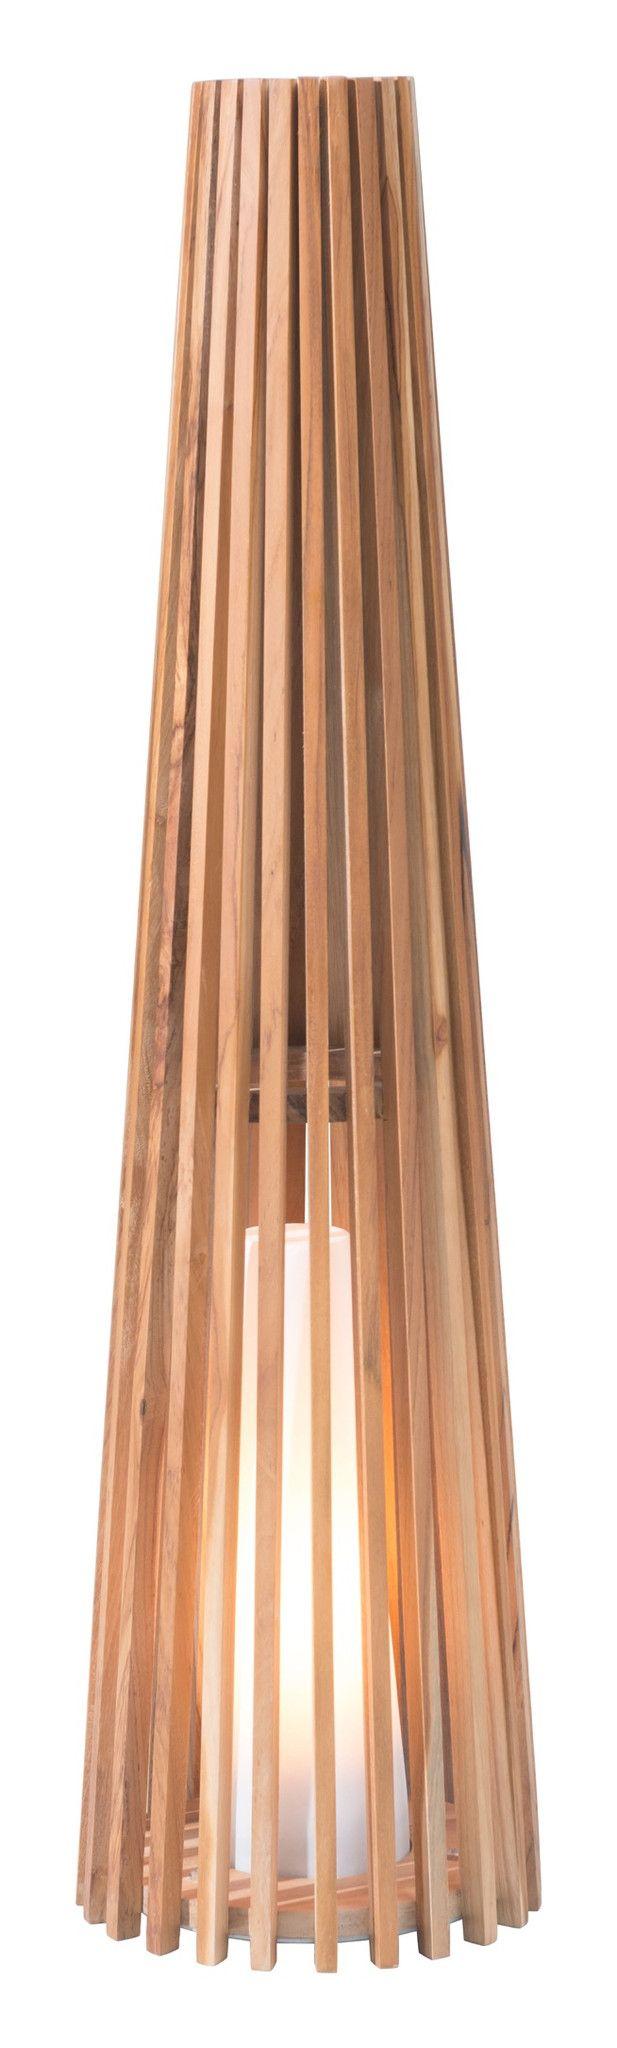 Outdoor floor lamp - Cosima Medium Outdoor Floor Lamp Natural Teak Fiberglass Resin